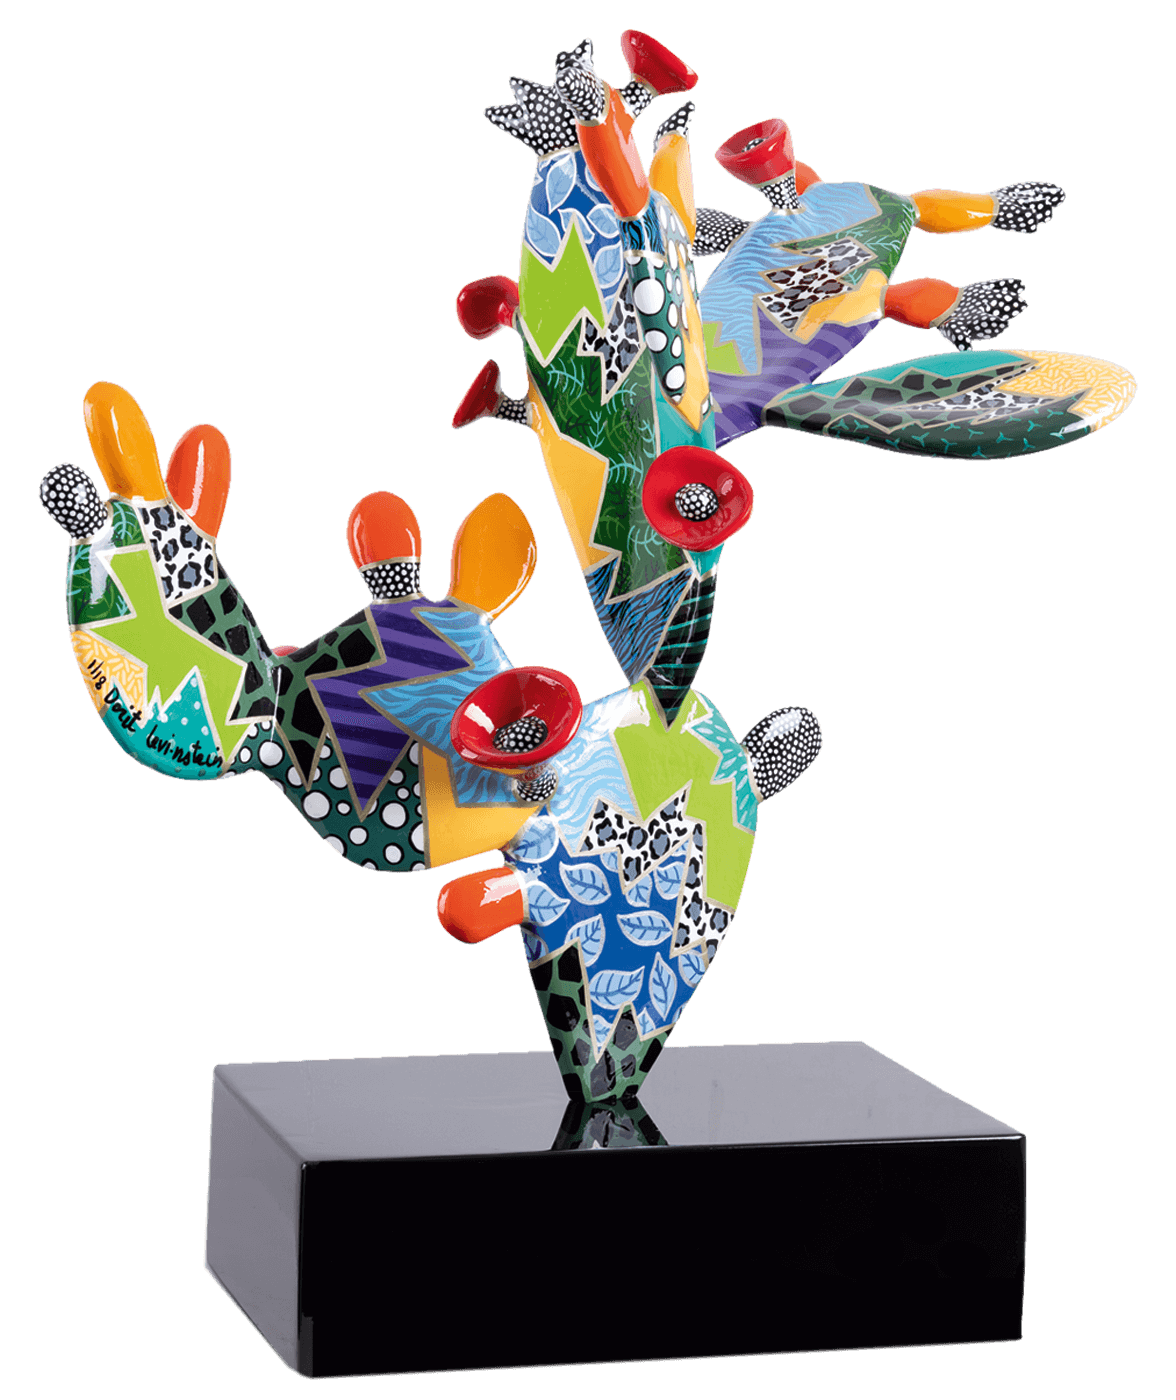 Cactus Kishkashta (Desert Blossom) - Dorit Levinstein - Eden Gallery